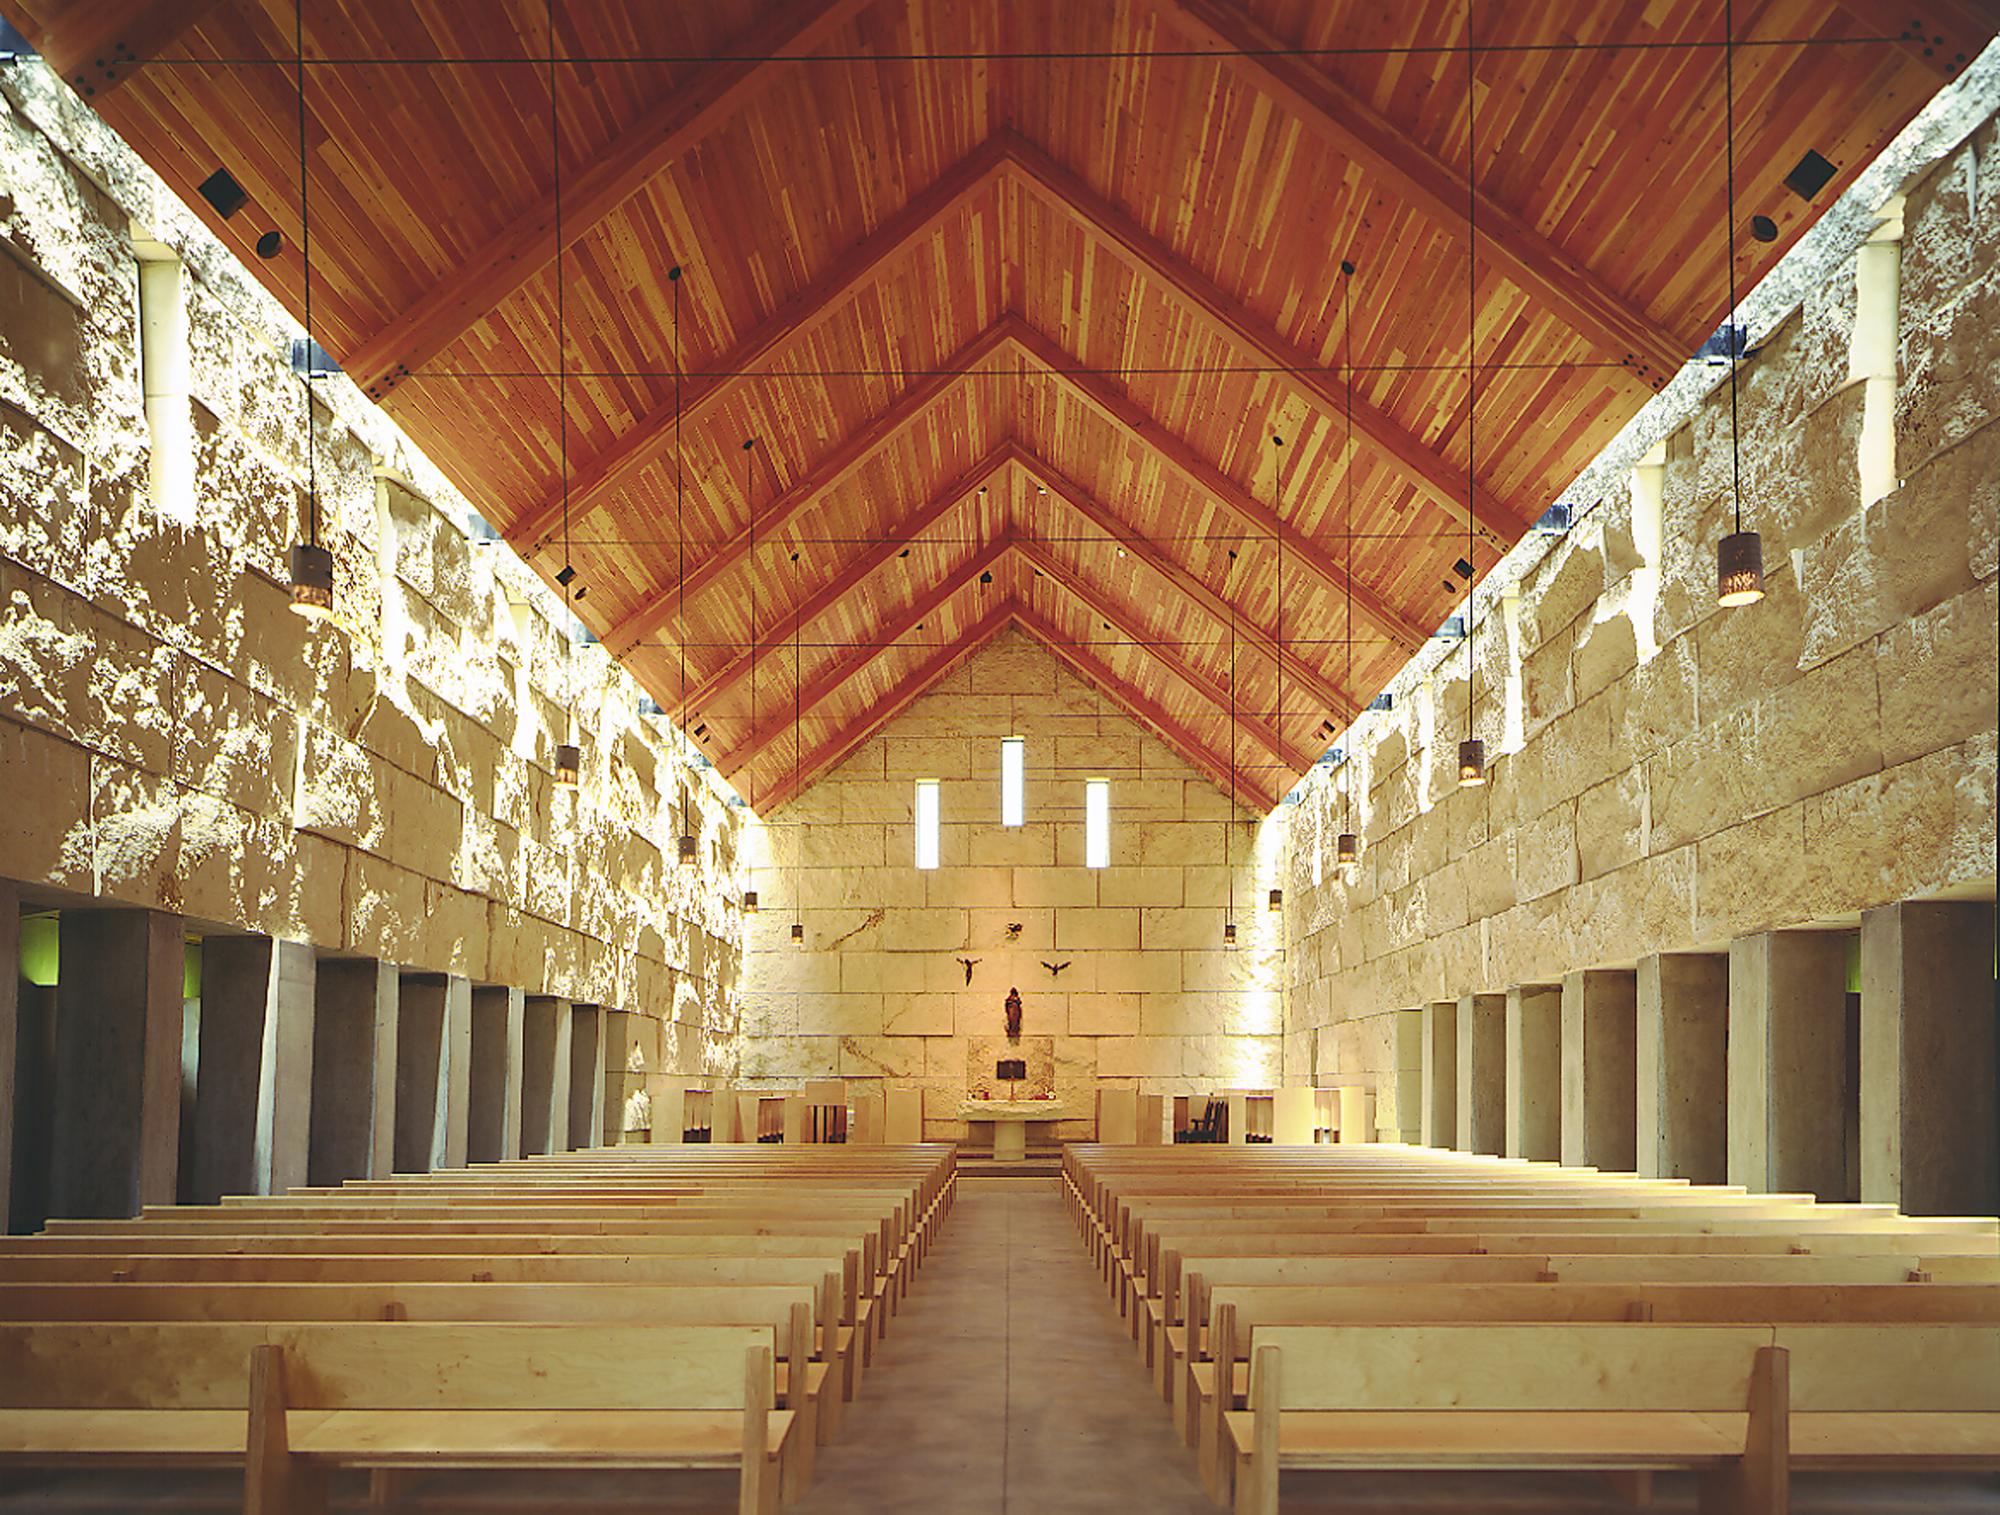 Cistercian Abbey Church / Cunningham Architects © James F. Wilson